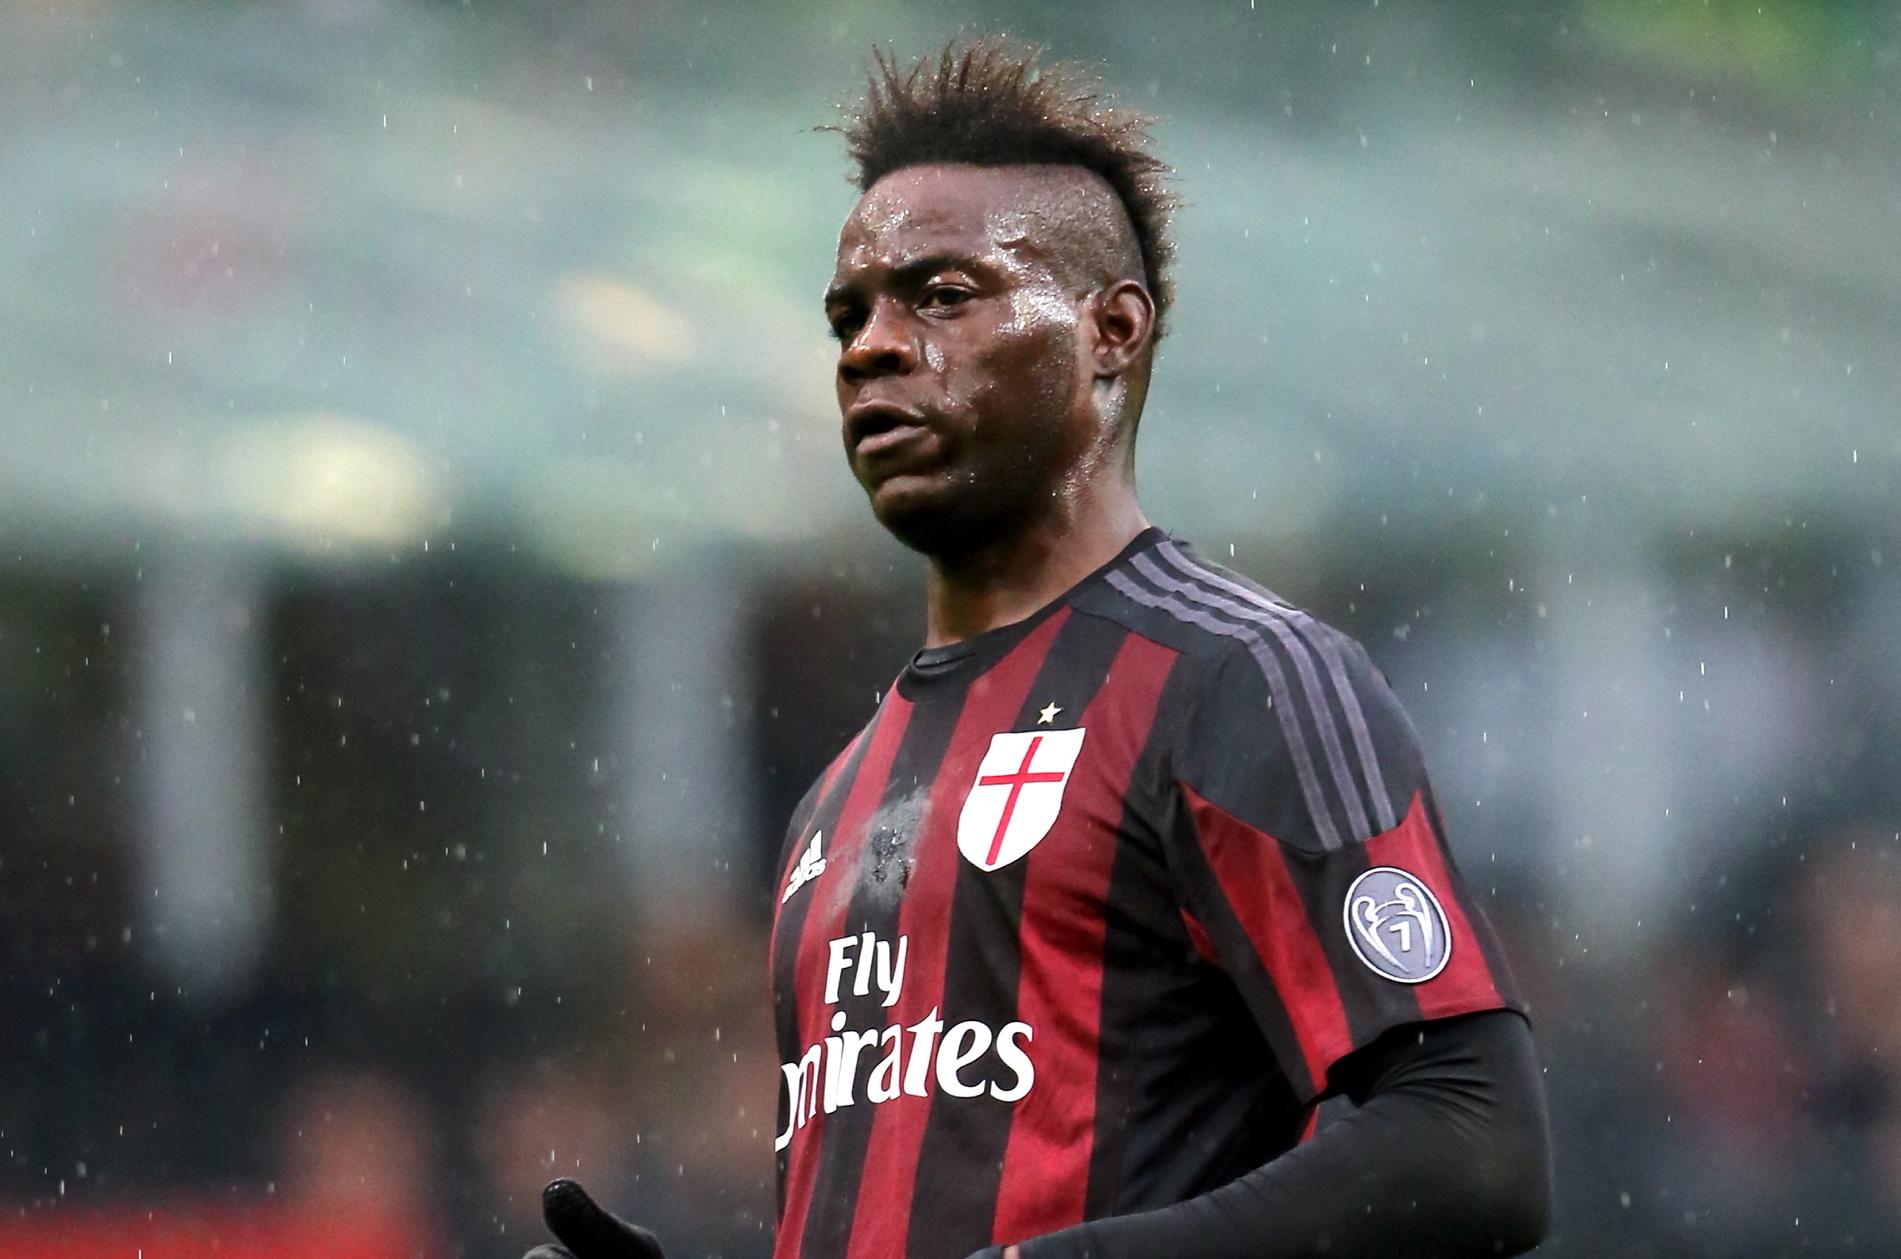 Italian Soccer Serie A - Milan vs Udinese